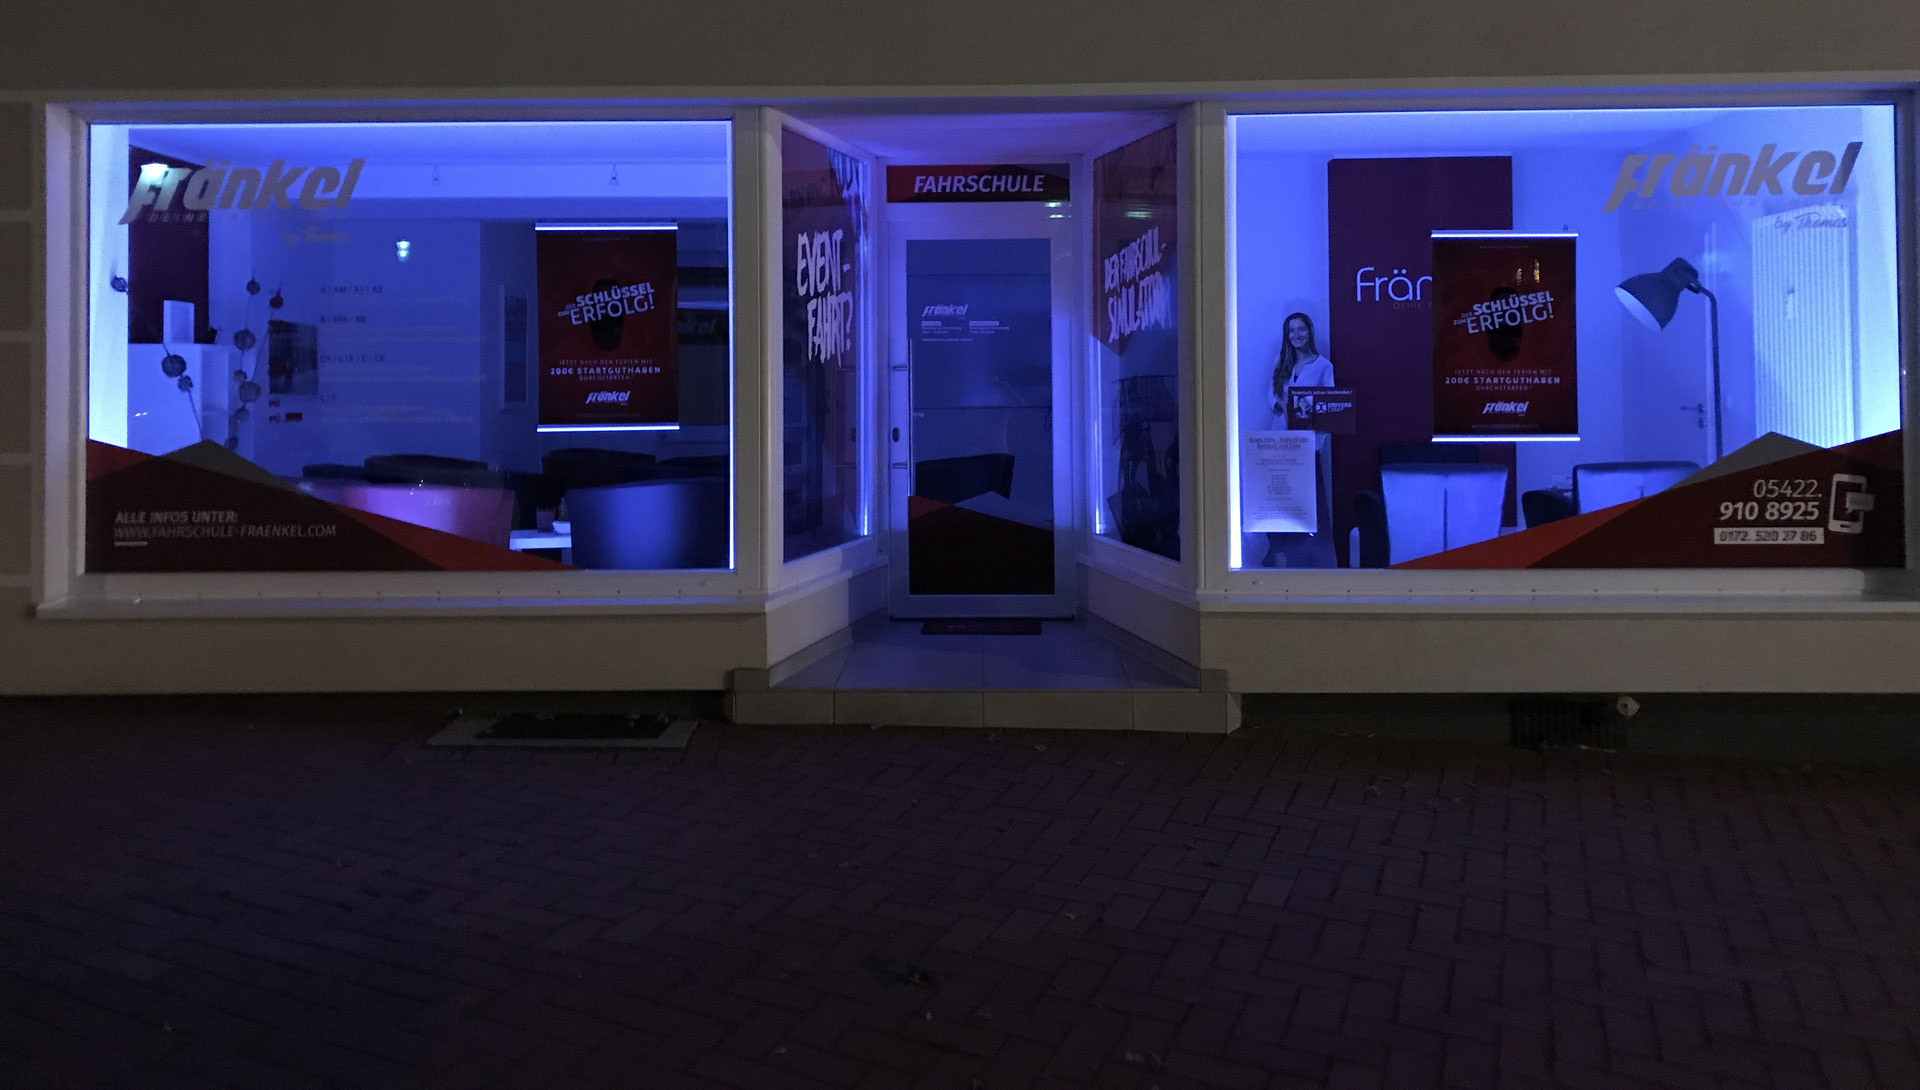 fahrschule fr nkel wellingholzhausen einfach besser. Black Bedroom Furniture Sets. Home Design Ideas